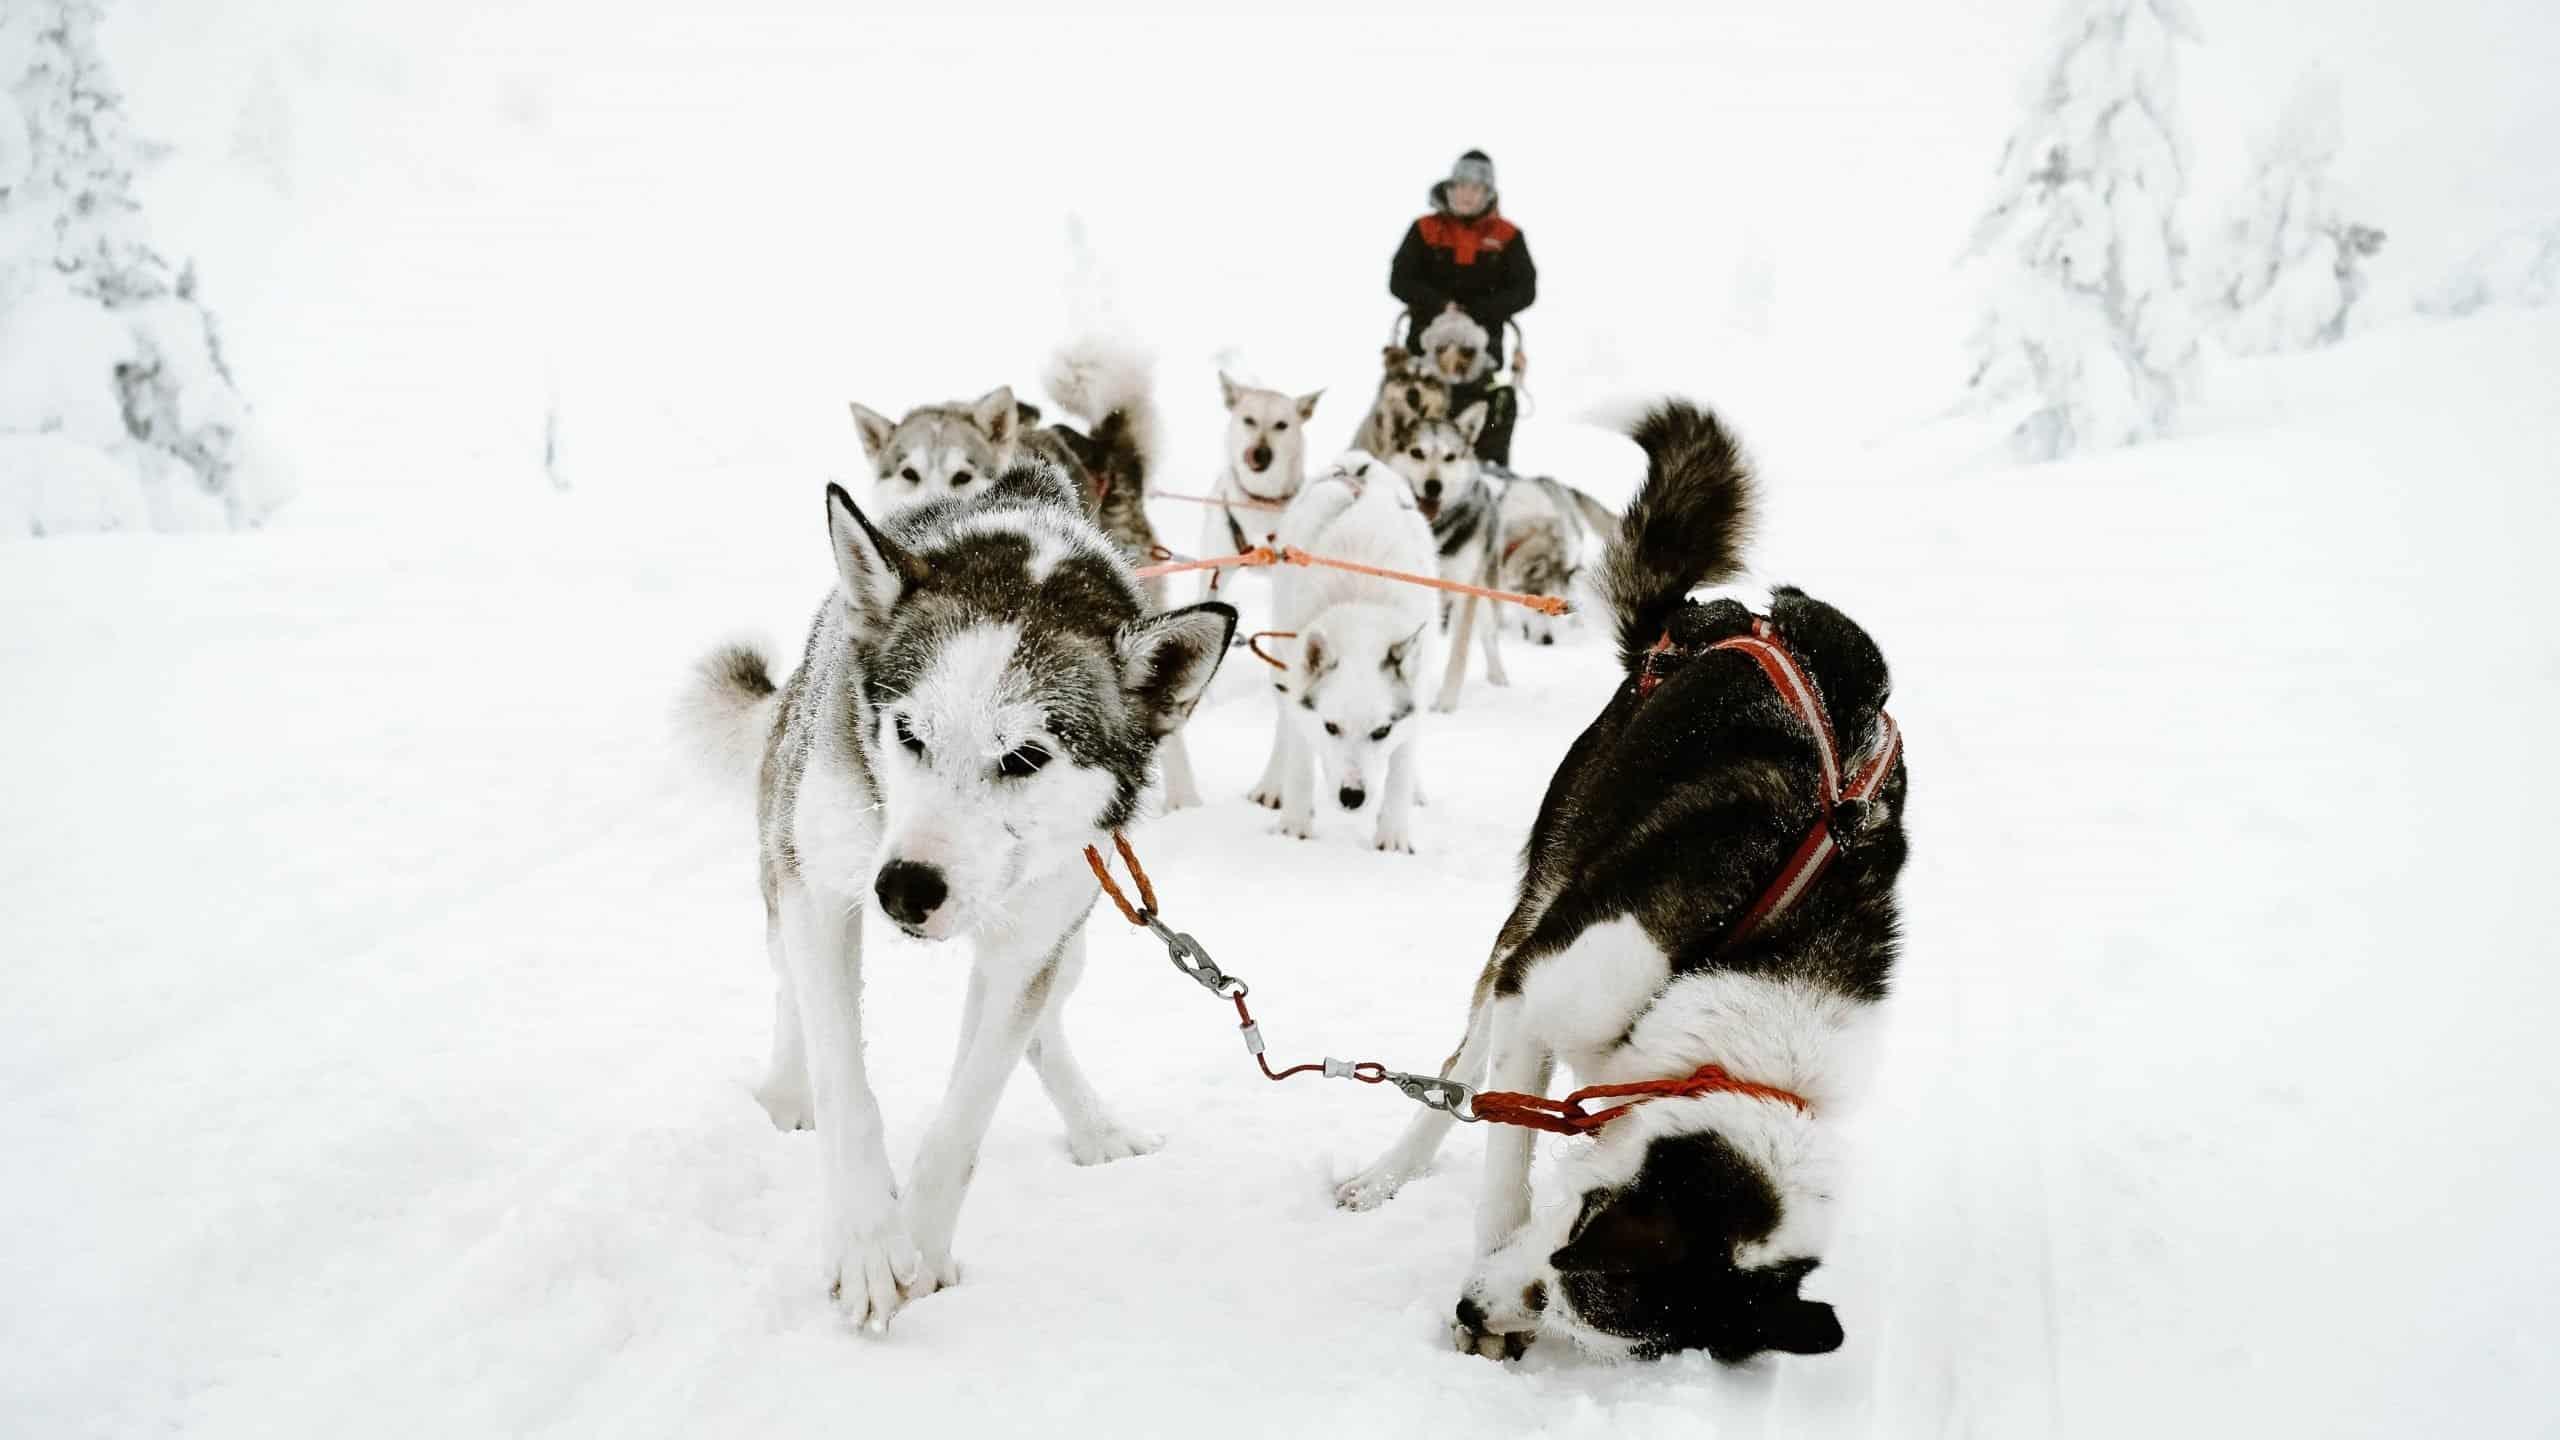 Huskies as sled dogs.